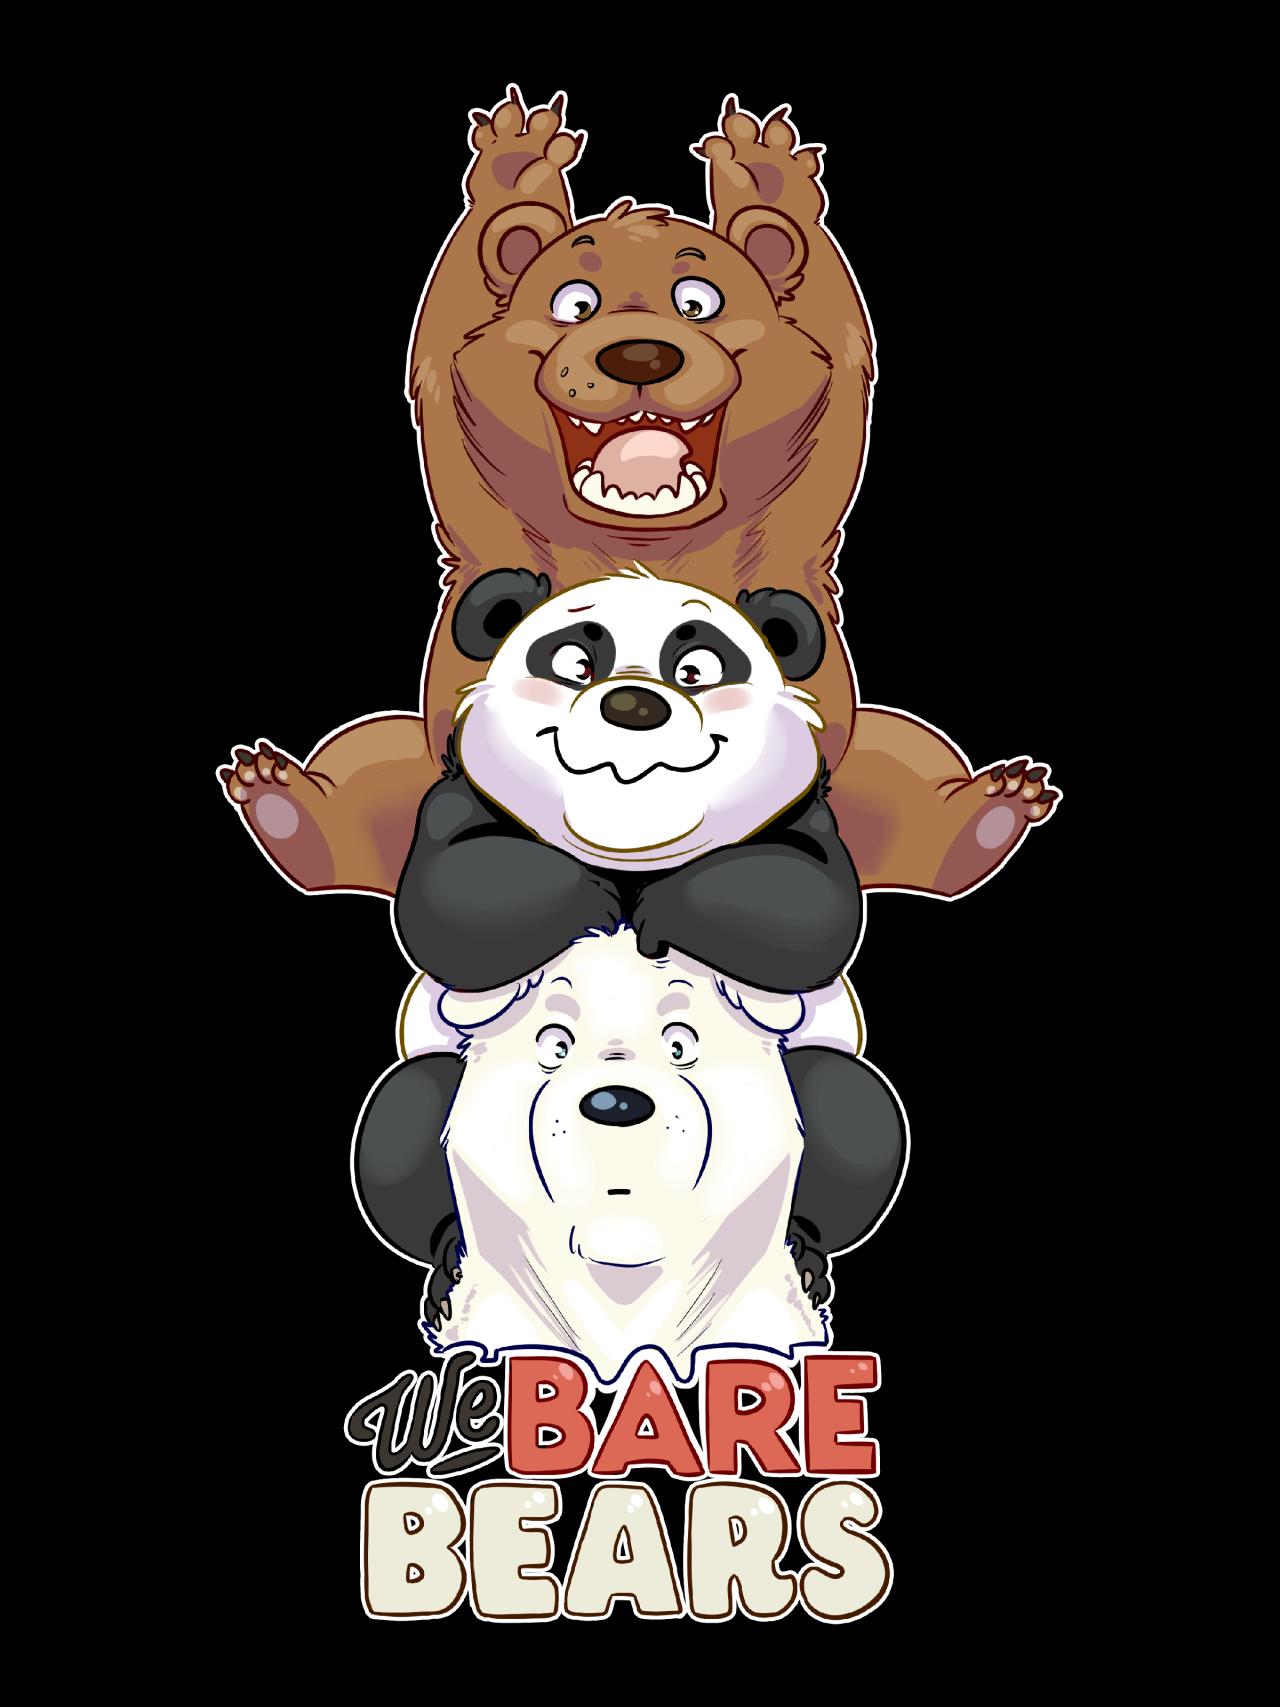 Bare Bear Giant Panda Cartoon Mammal Vertebrate Poster We